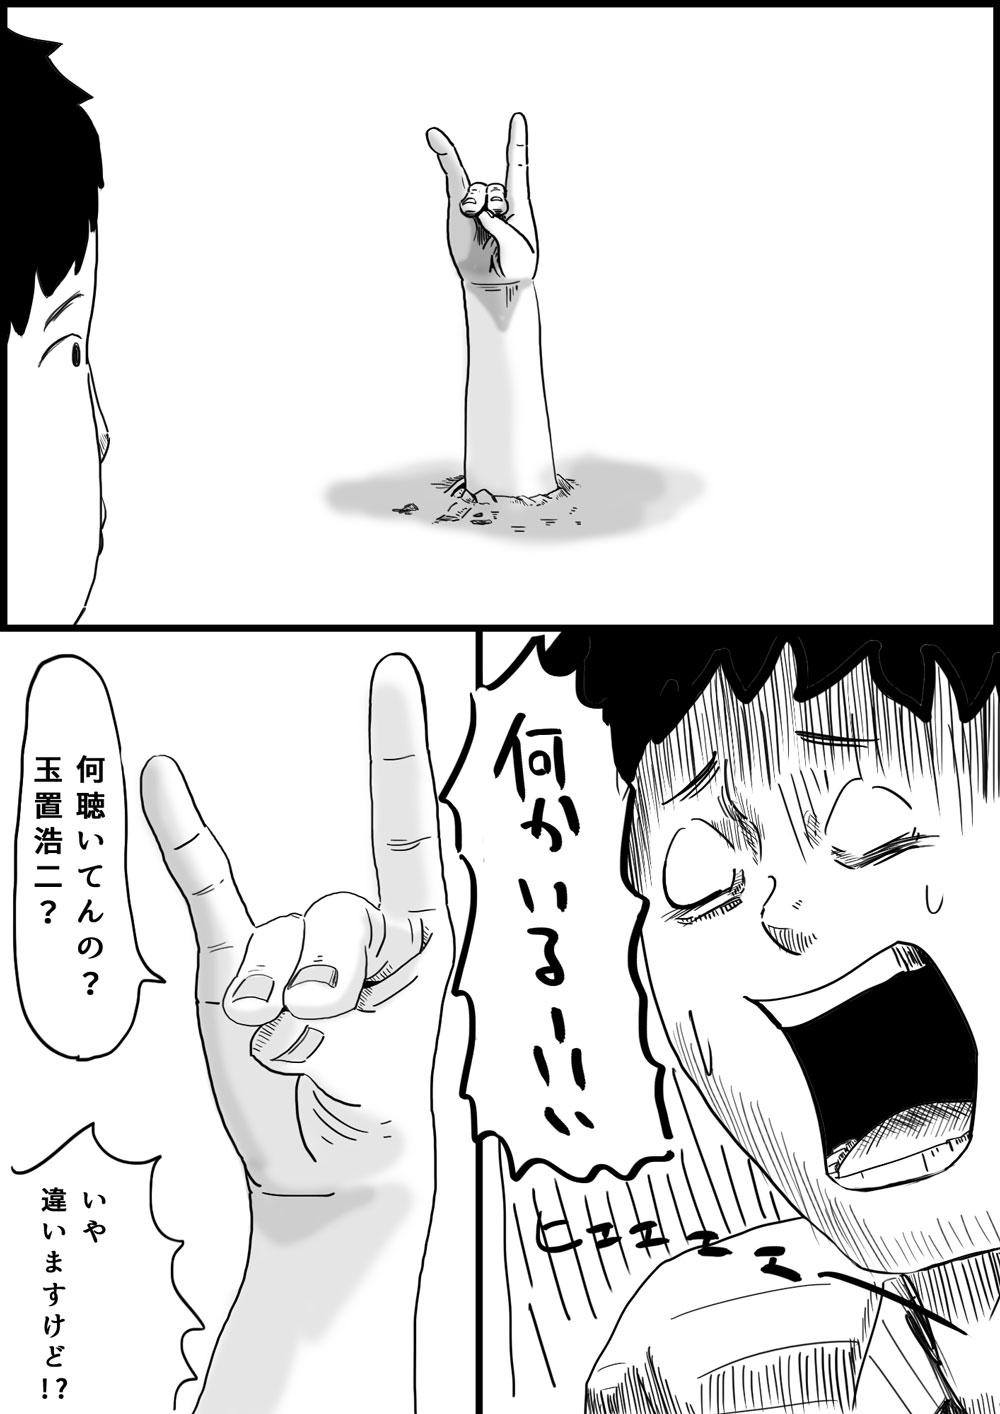 arnolds-hasegawa-001-3